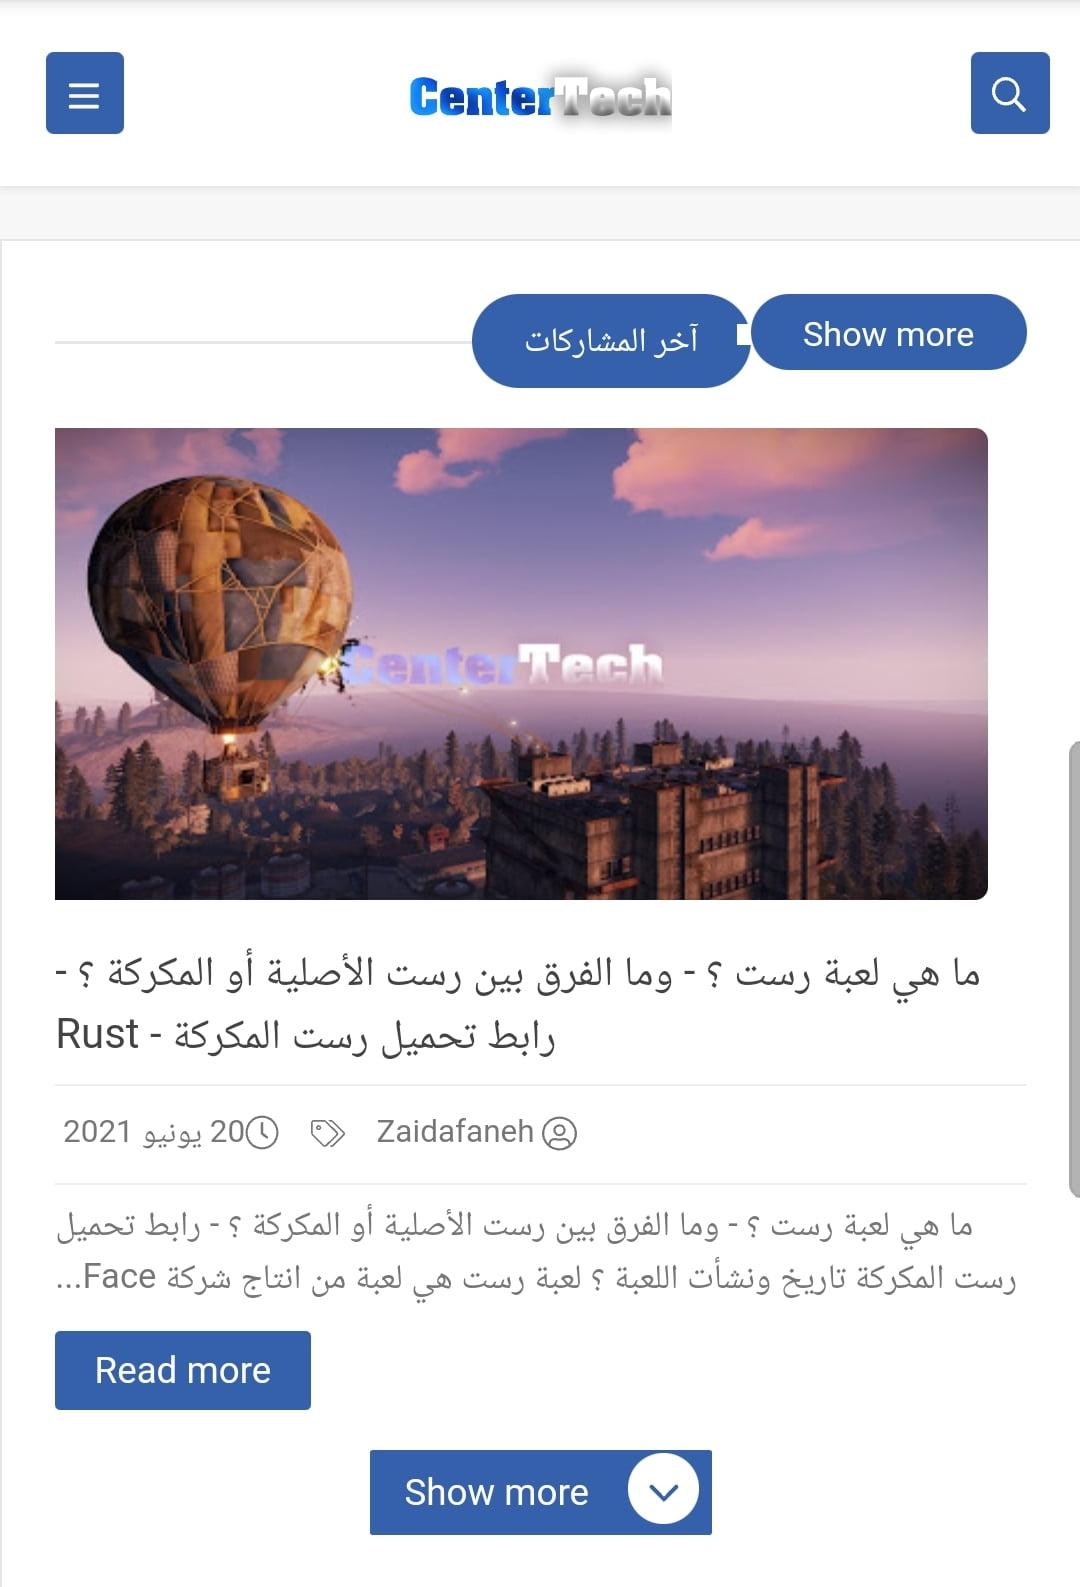 SmartSelect ٢٠٢١٠٦٢٢ ٠٥٢٦٢٩ Chrome